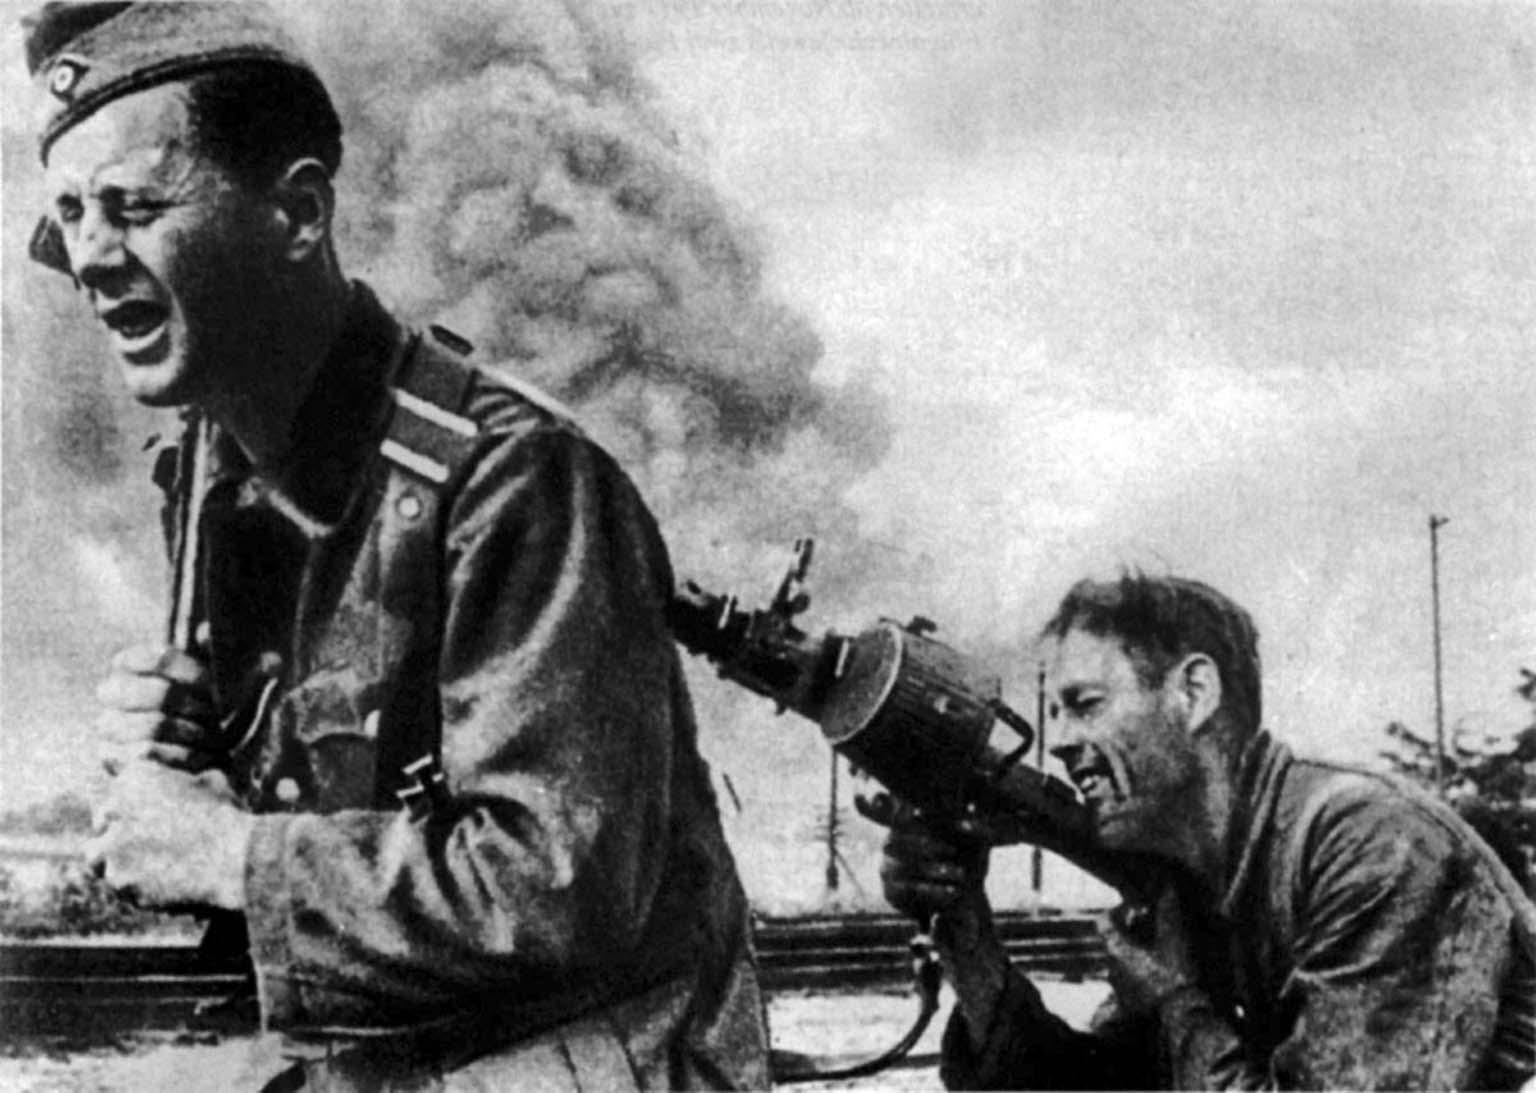 MG.34